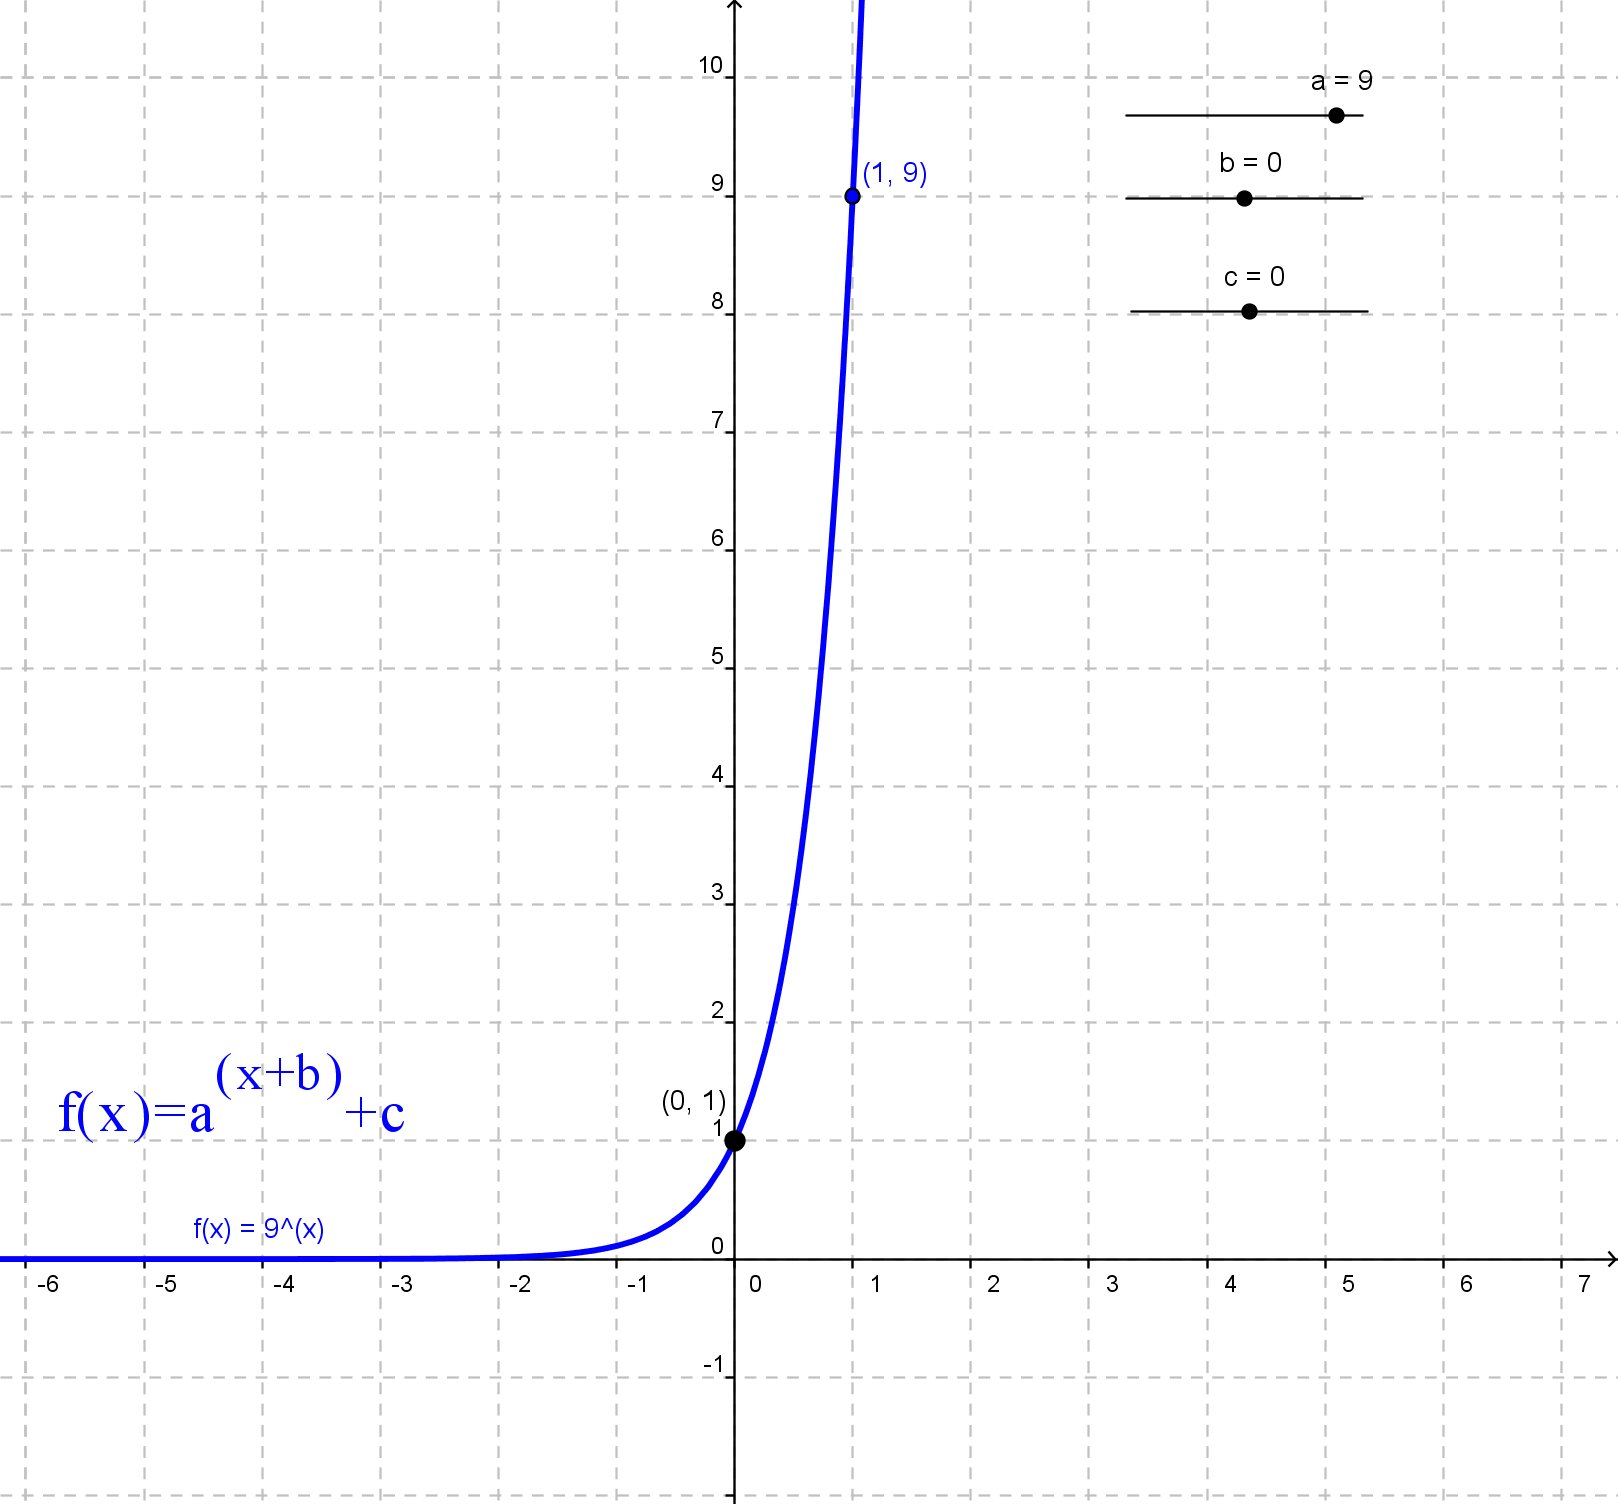 exponencial.ggb